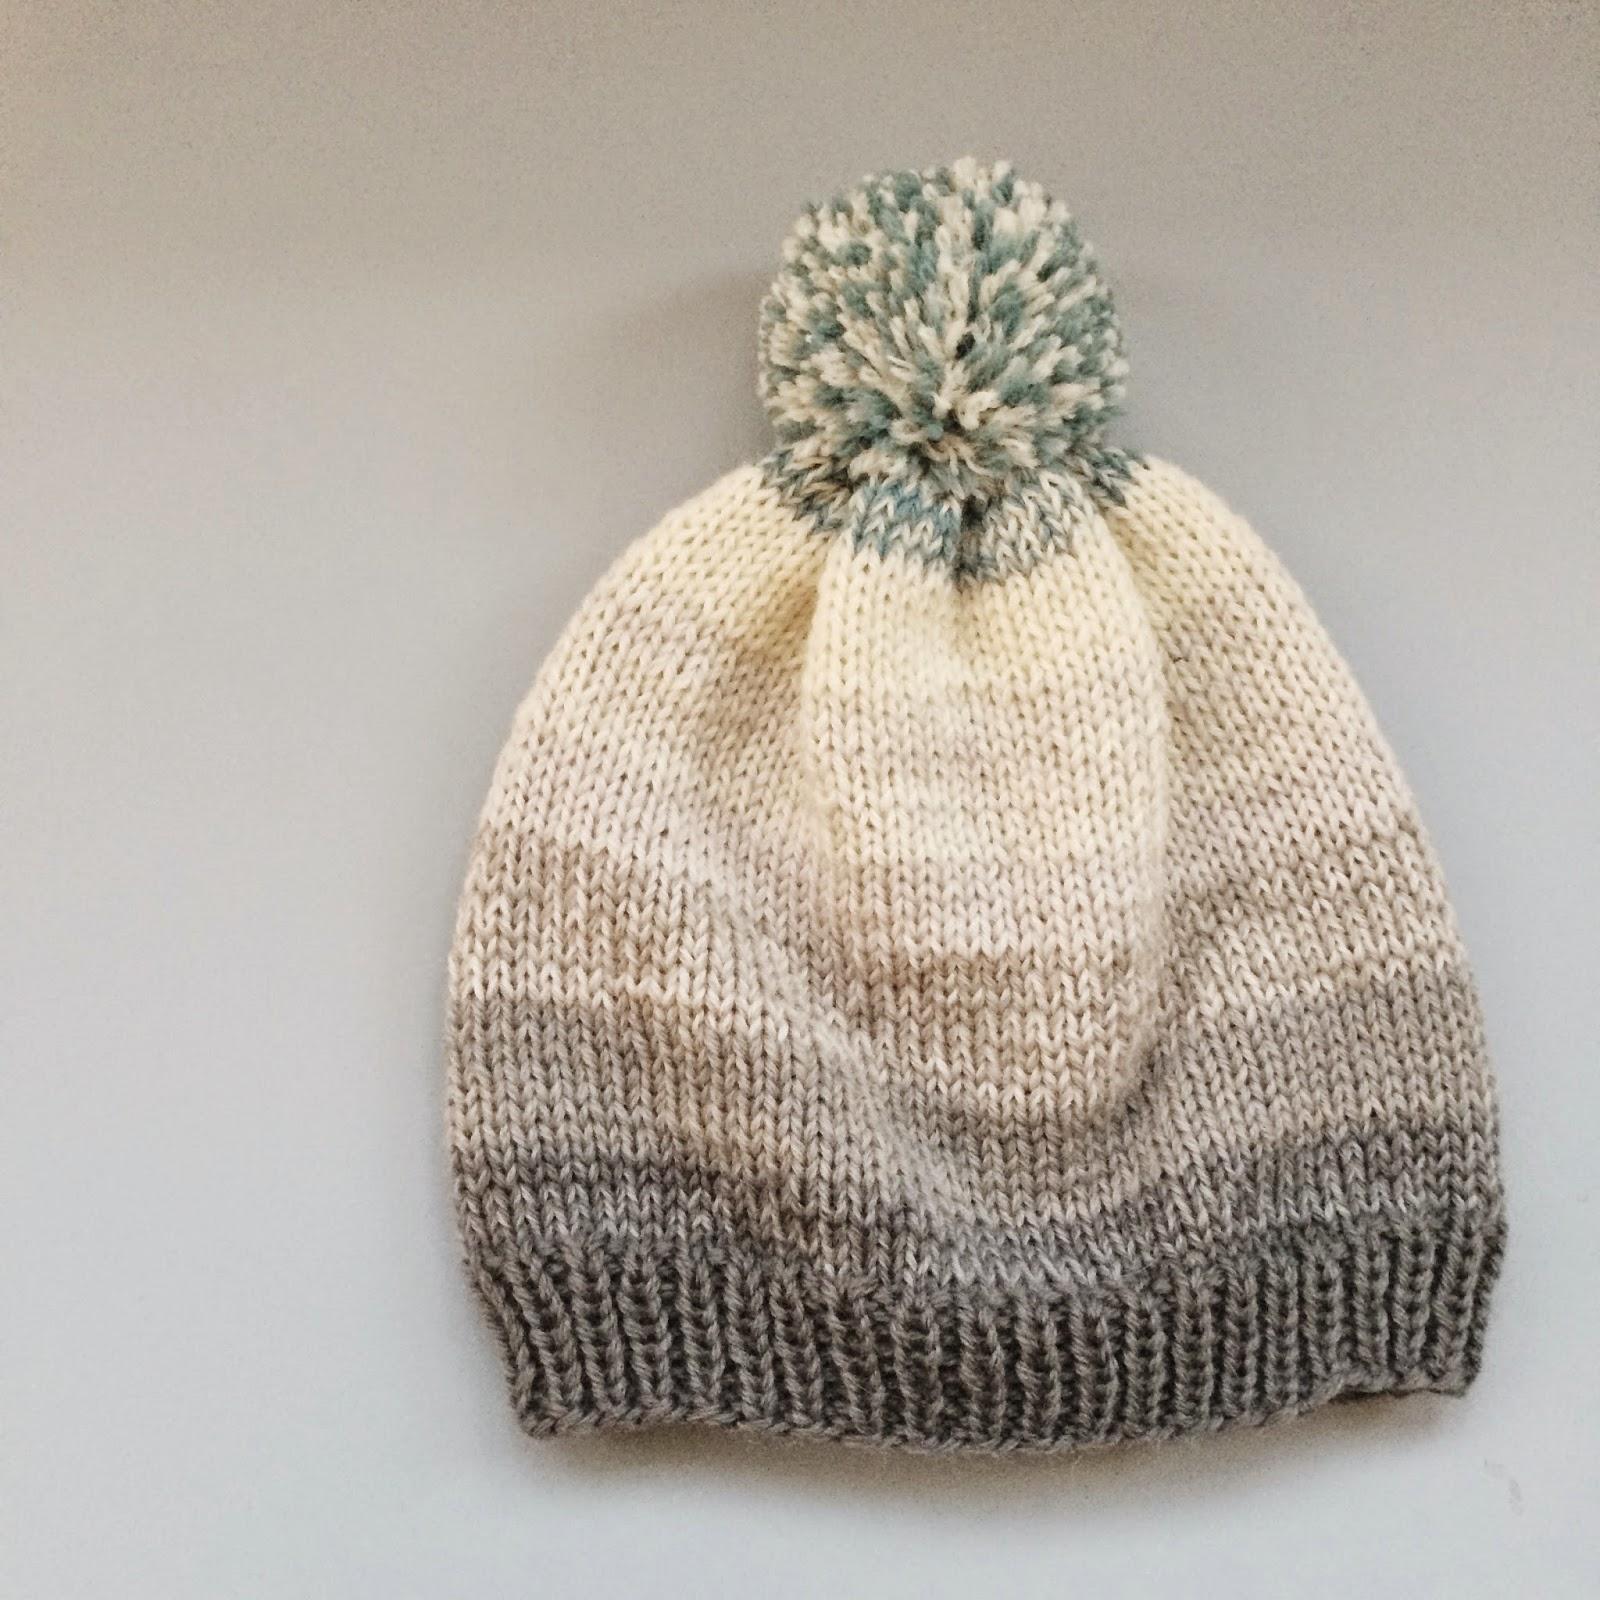 Beanie for beginners. Knitting pattern from Meraki